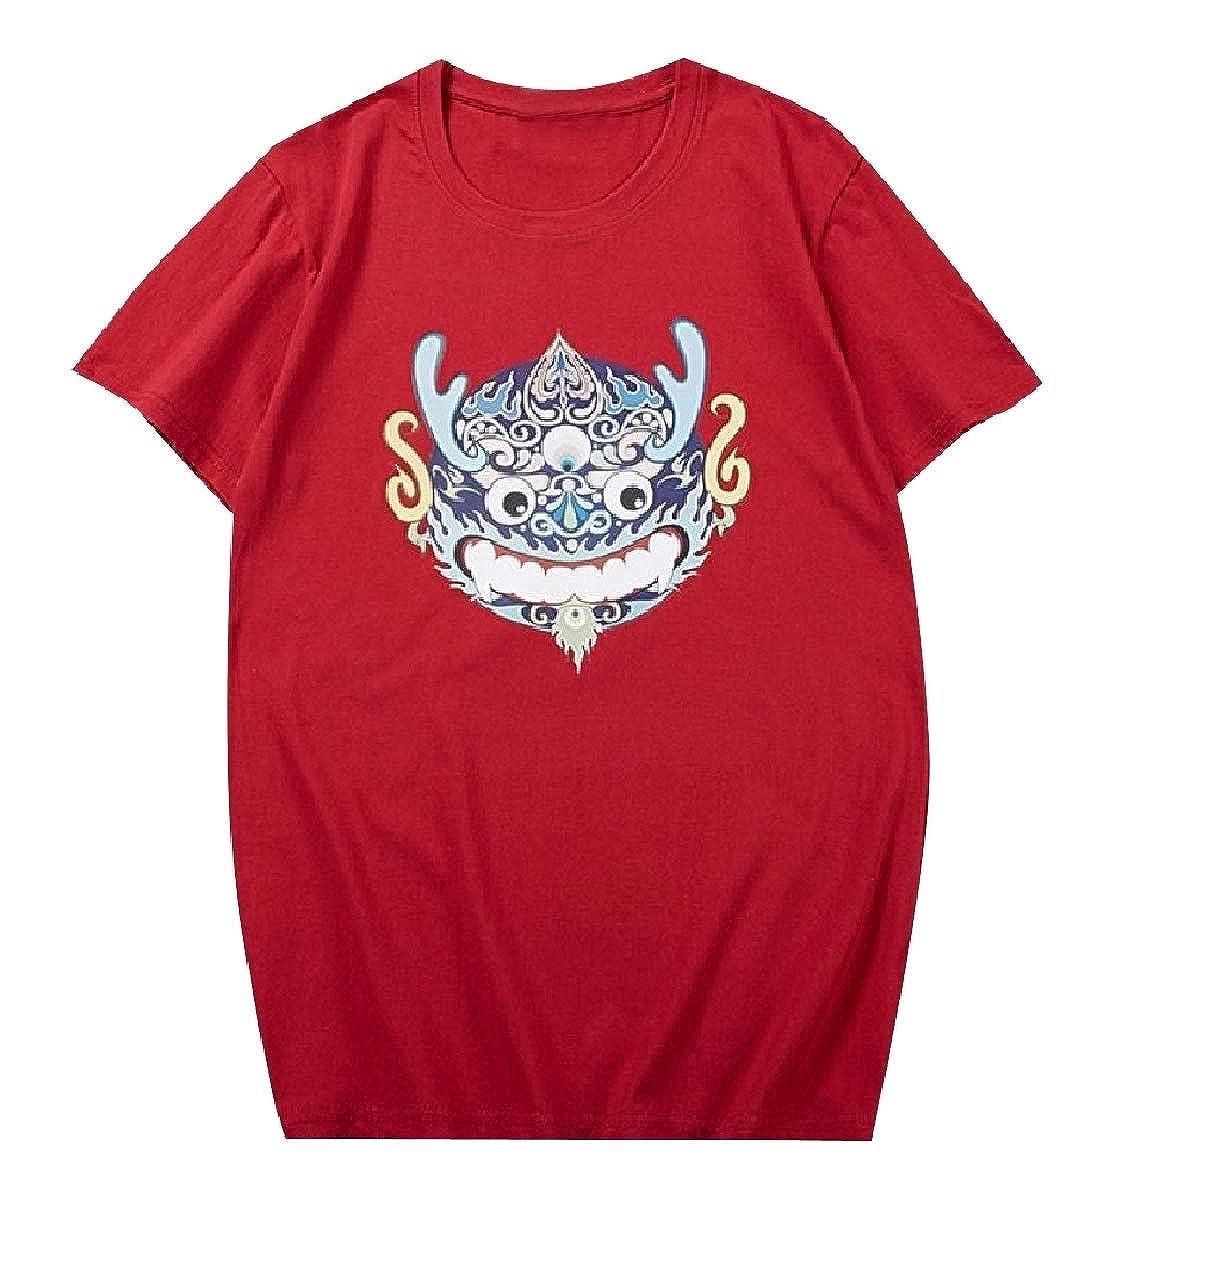 Zimaes-Men Short Sleeve 100/% Cotton Soft Breathable Loose T-Shirt Tops